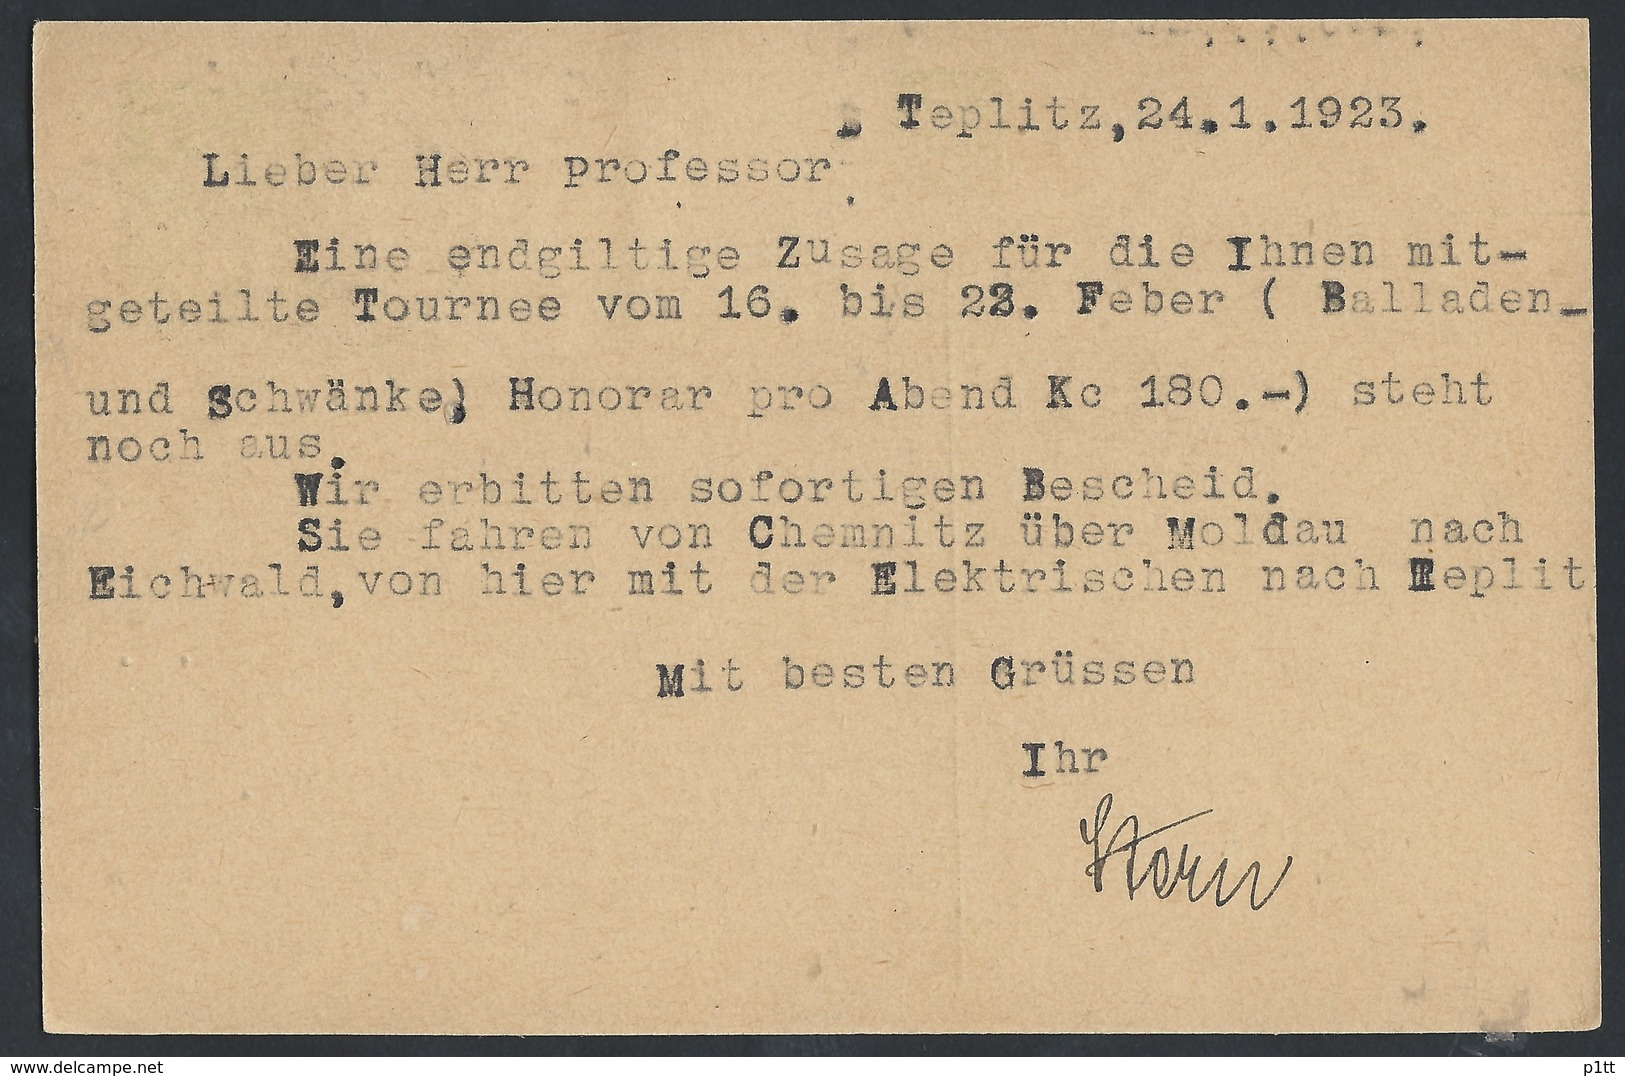 2ch.Postcard. The Mail Went To 1923 Teplice Berlin. Professor Of Art History - Czechoslovakia